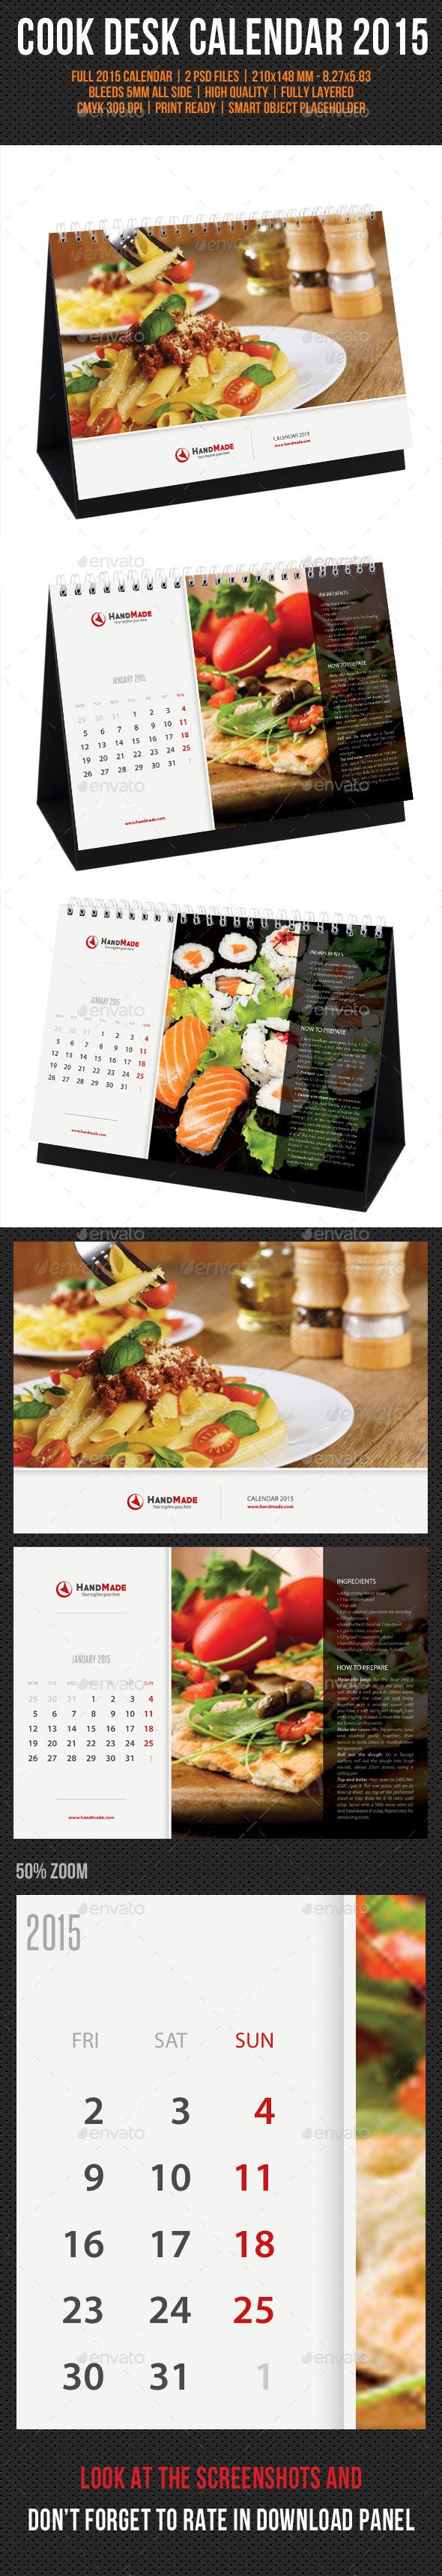 GraphicRiver Cook And Food Desk Calendar 2015 9612840